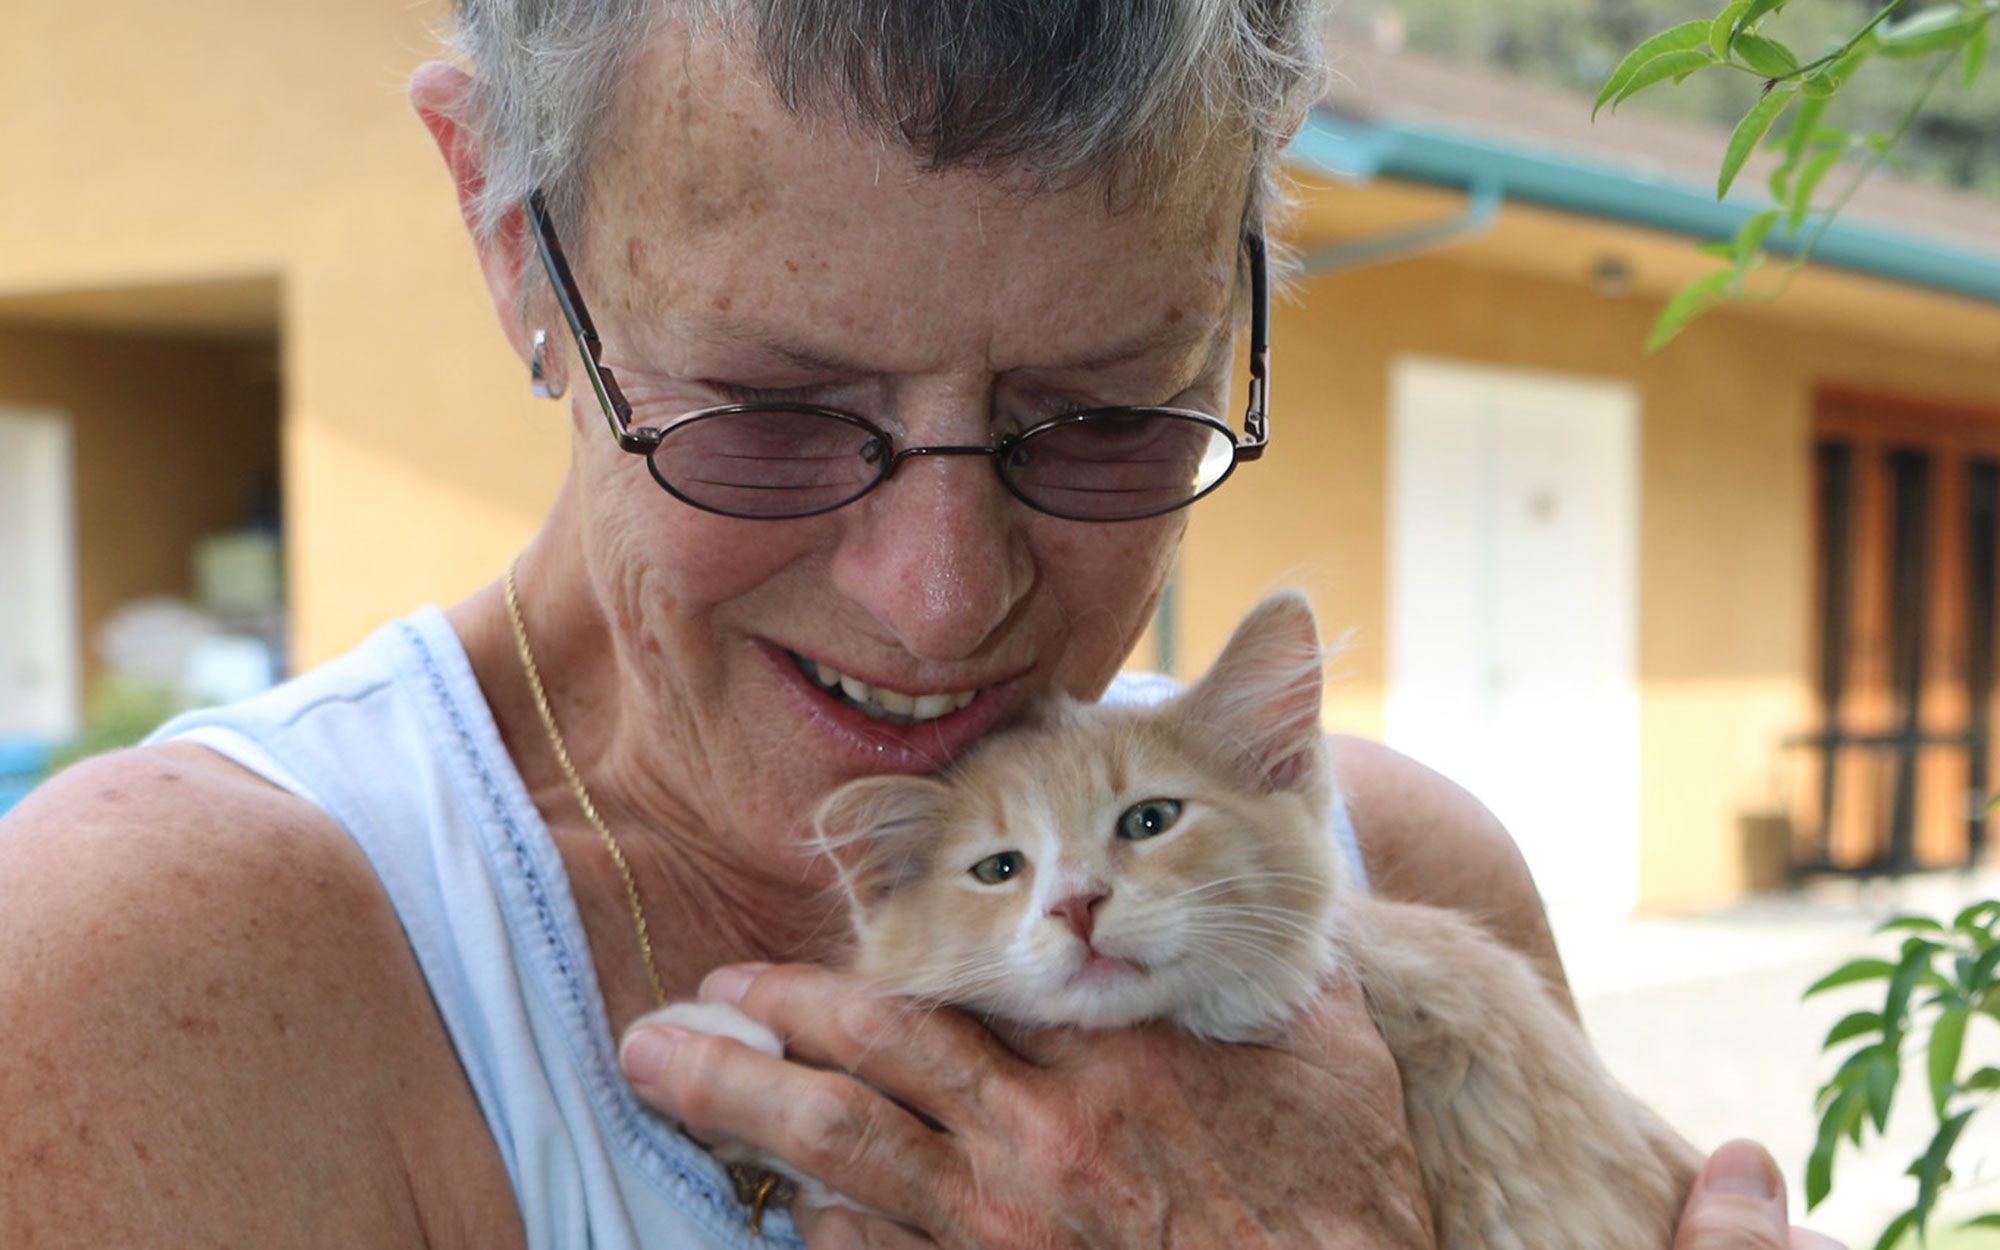 A volunteer holding an orange tabby kitten